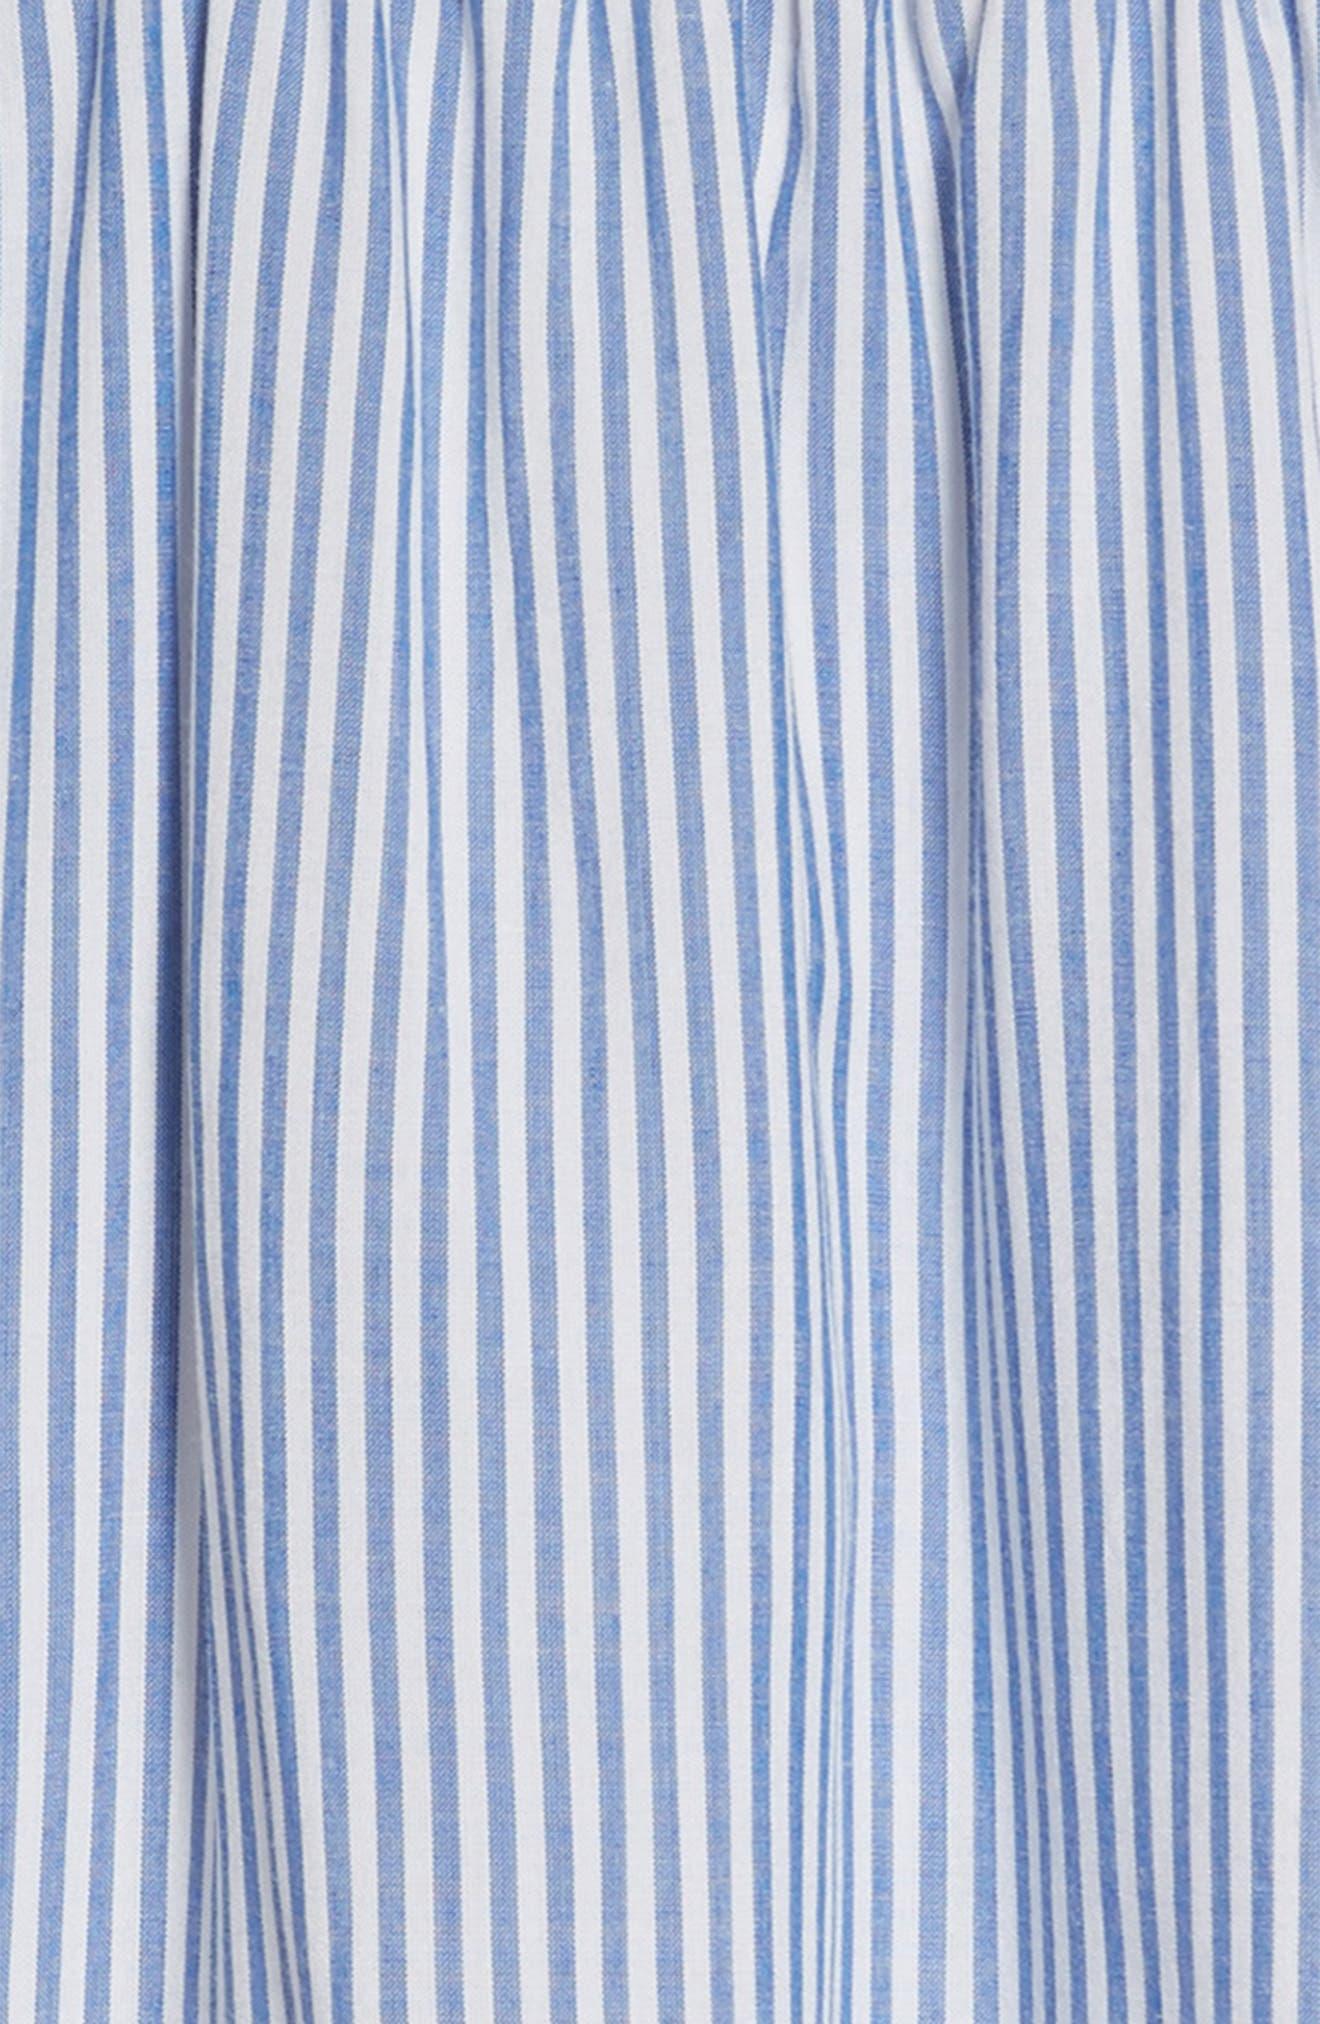 Poplin Stripe Ruffle Dress,                             Alternate thumbnail 3, color,                             400